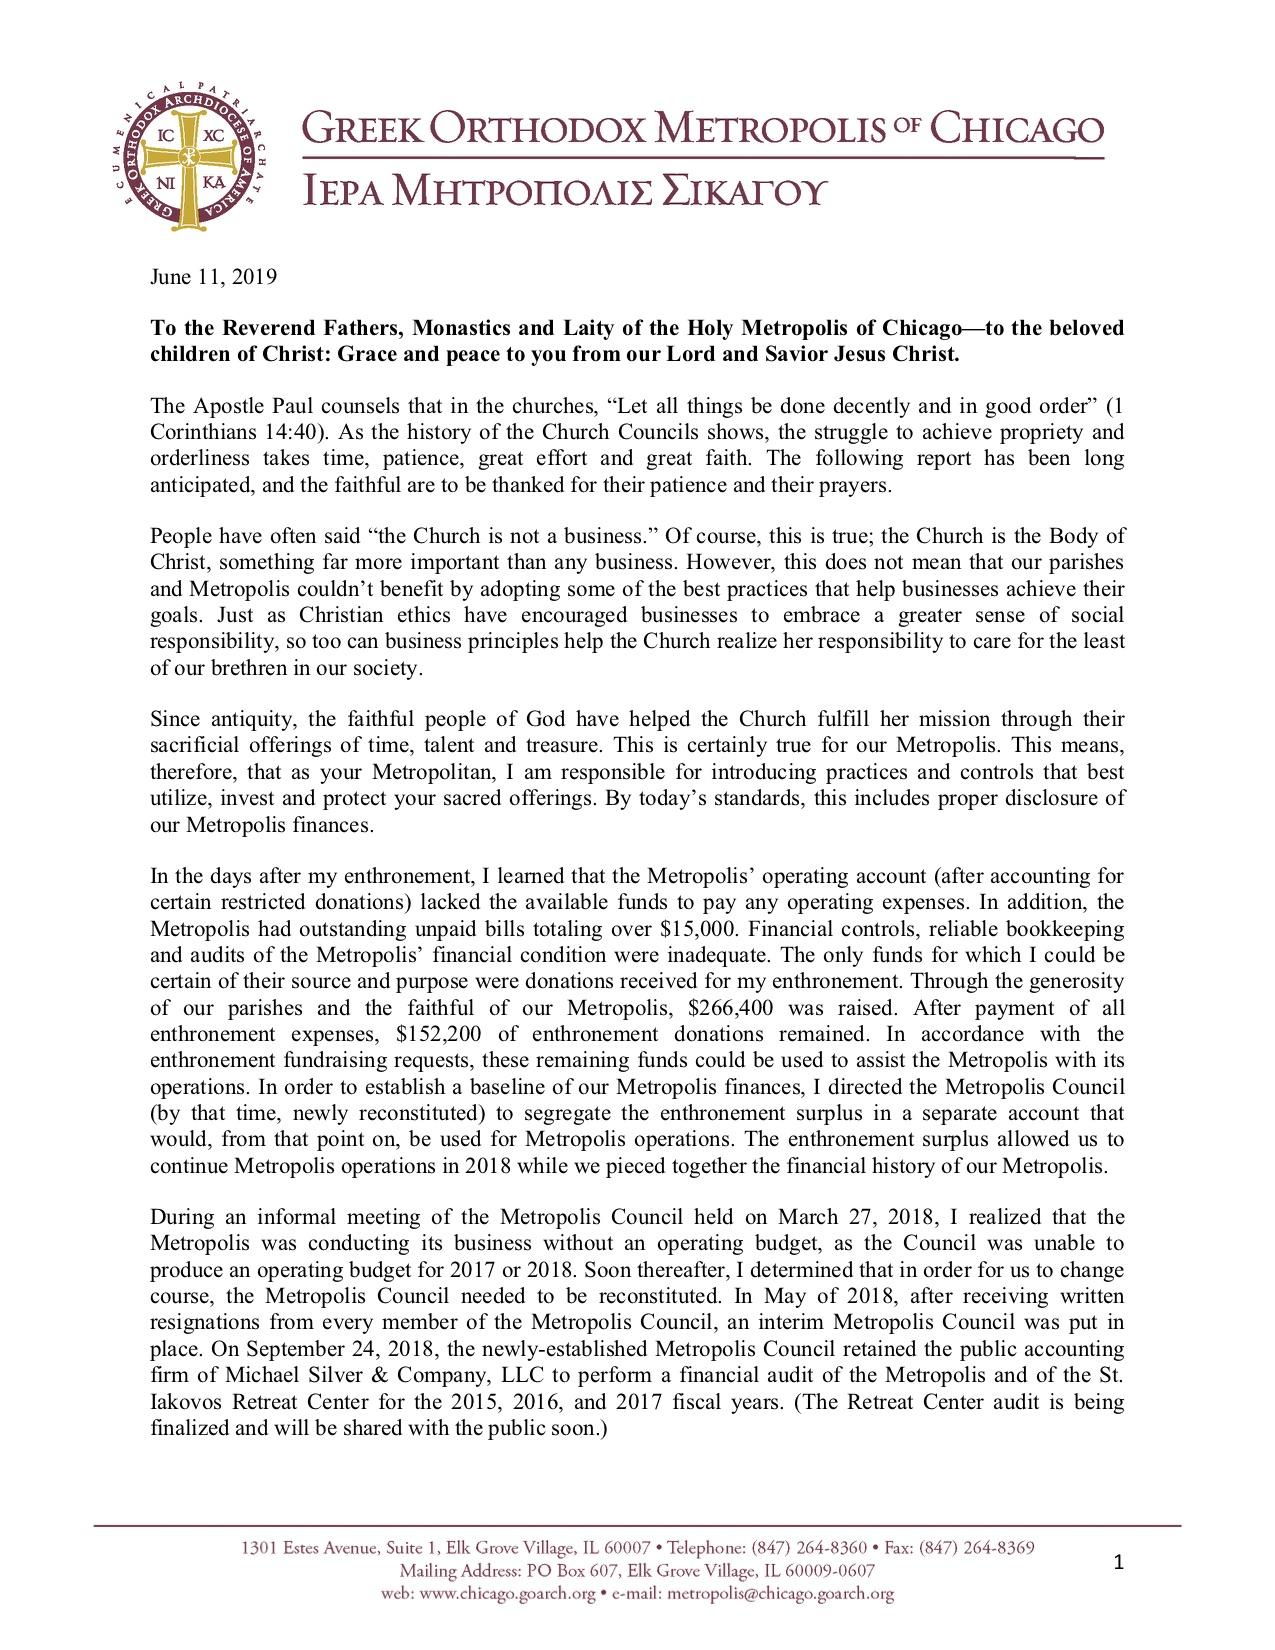 HEMN Letter re Metropolis Finances June 2019.jpg